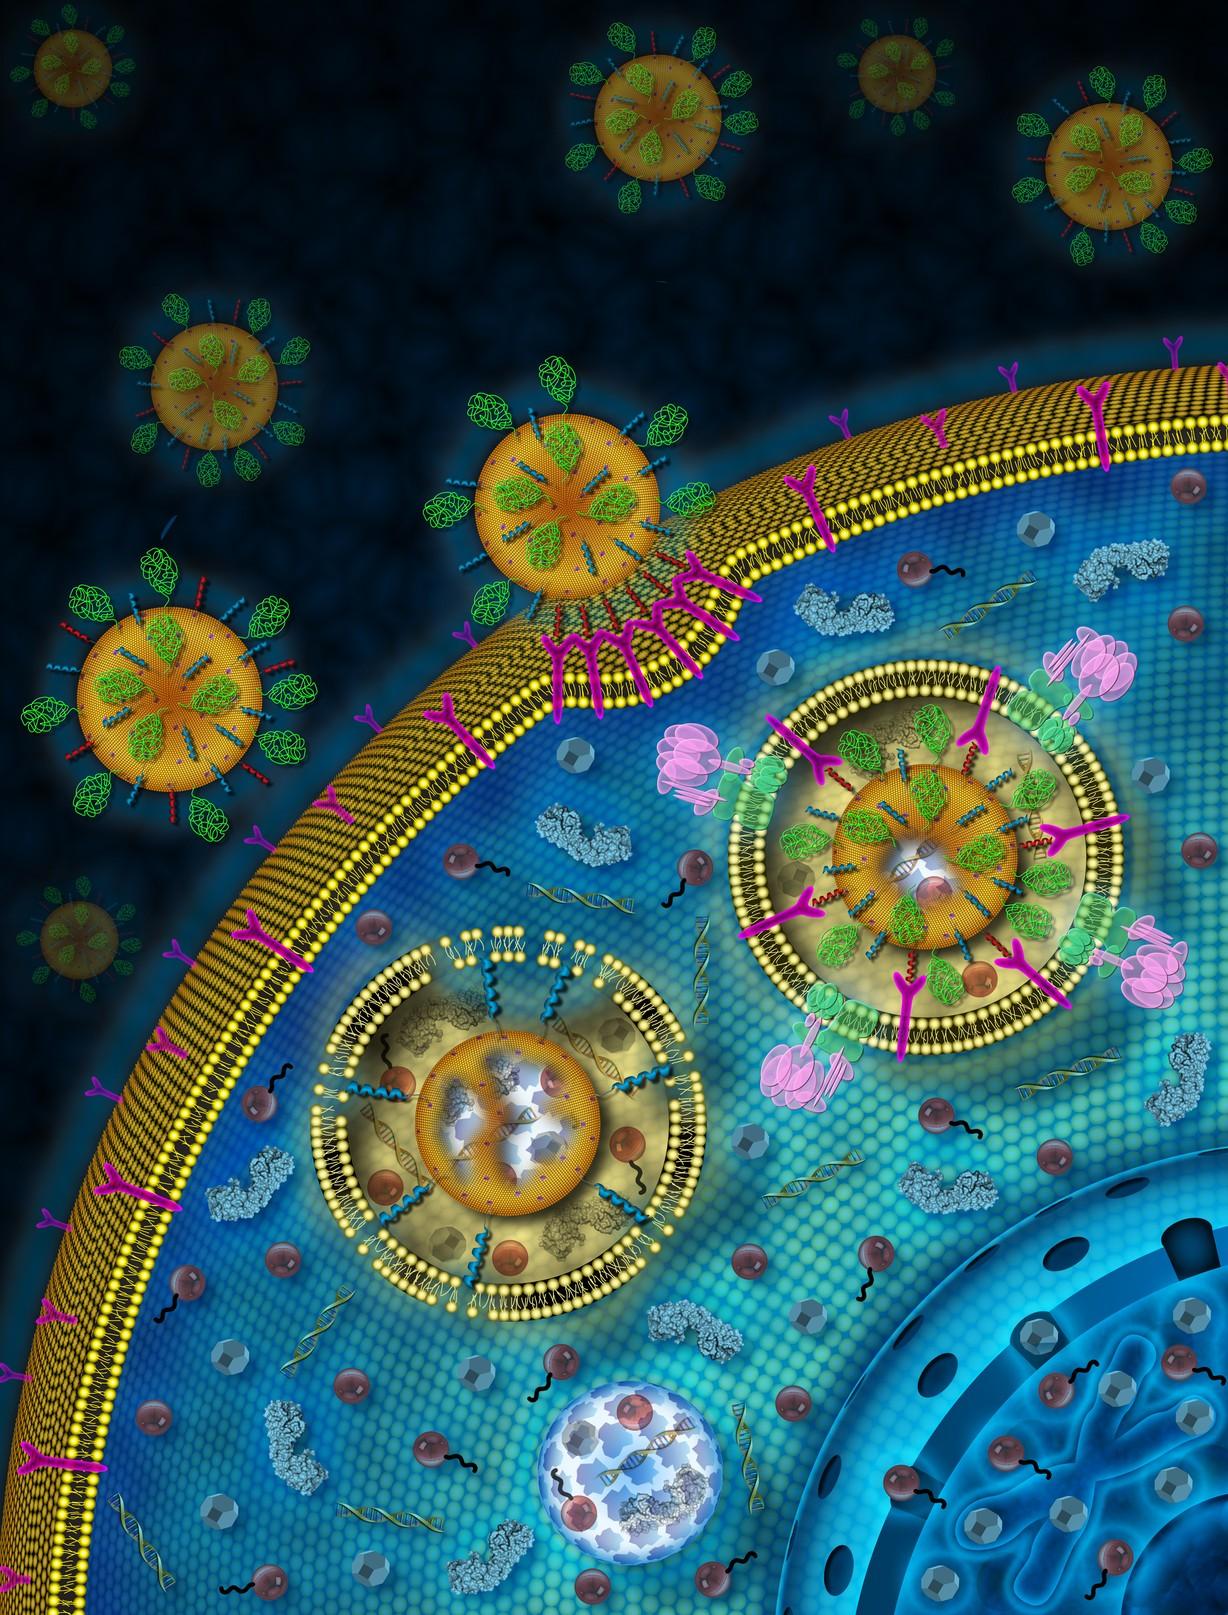 COVID Nanotechnology